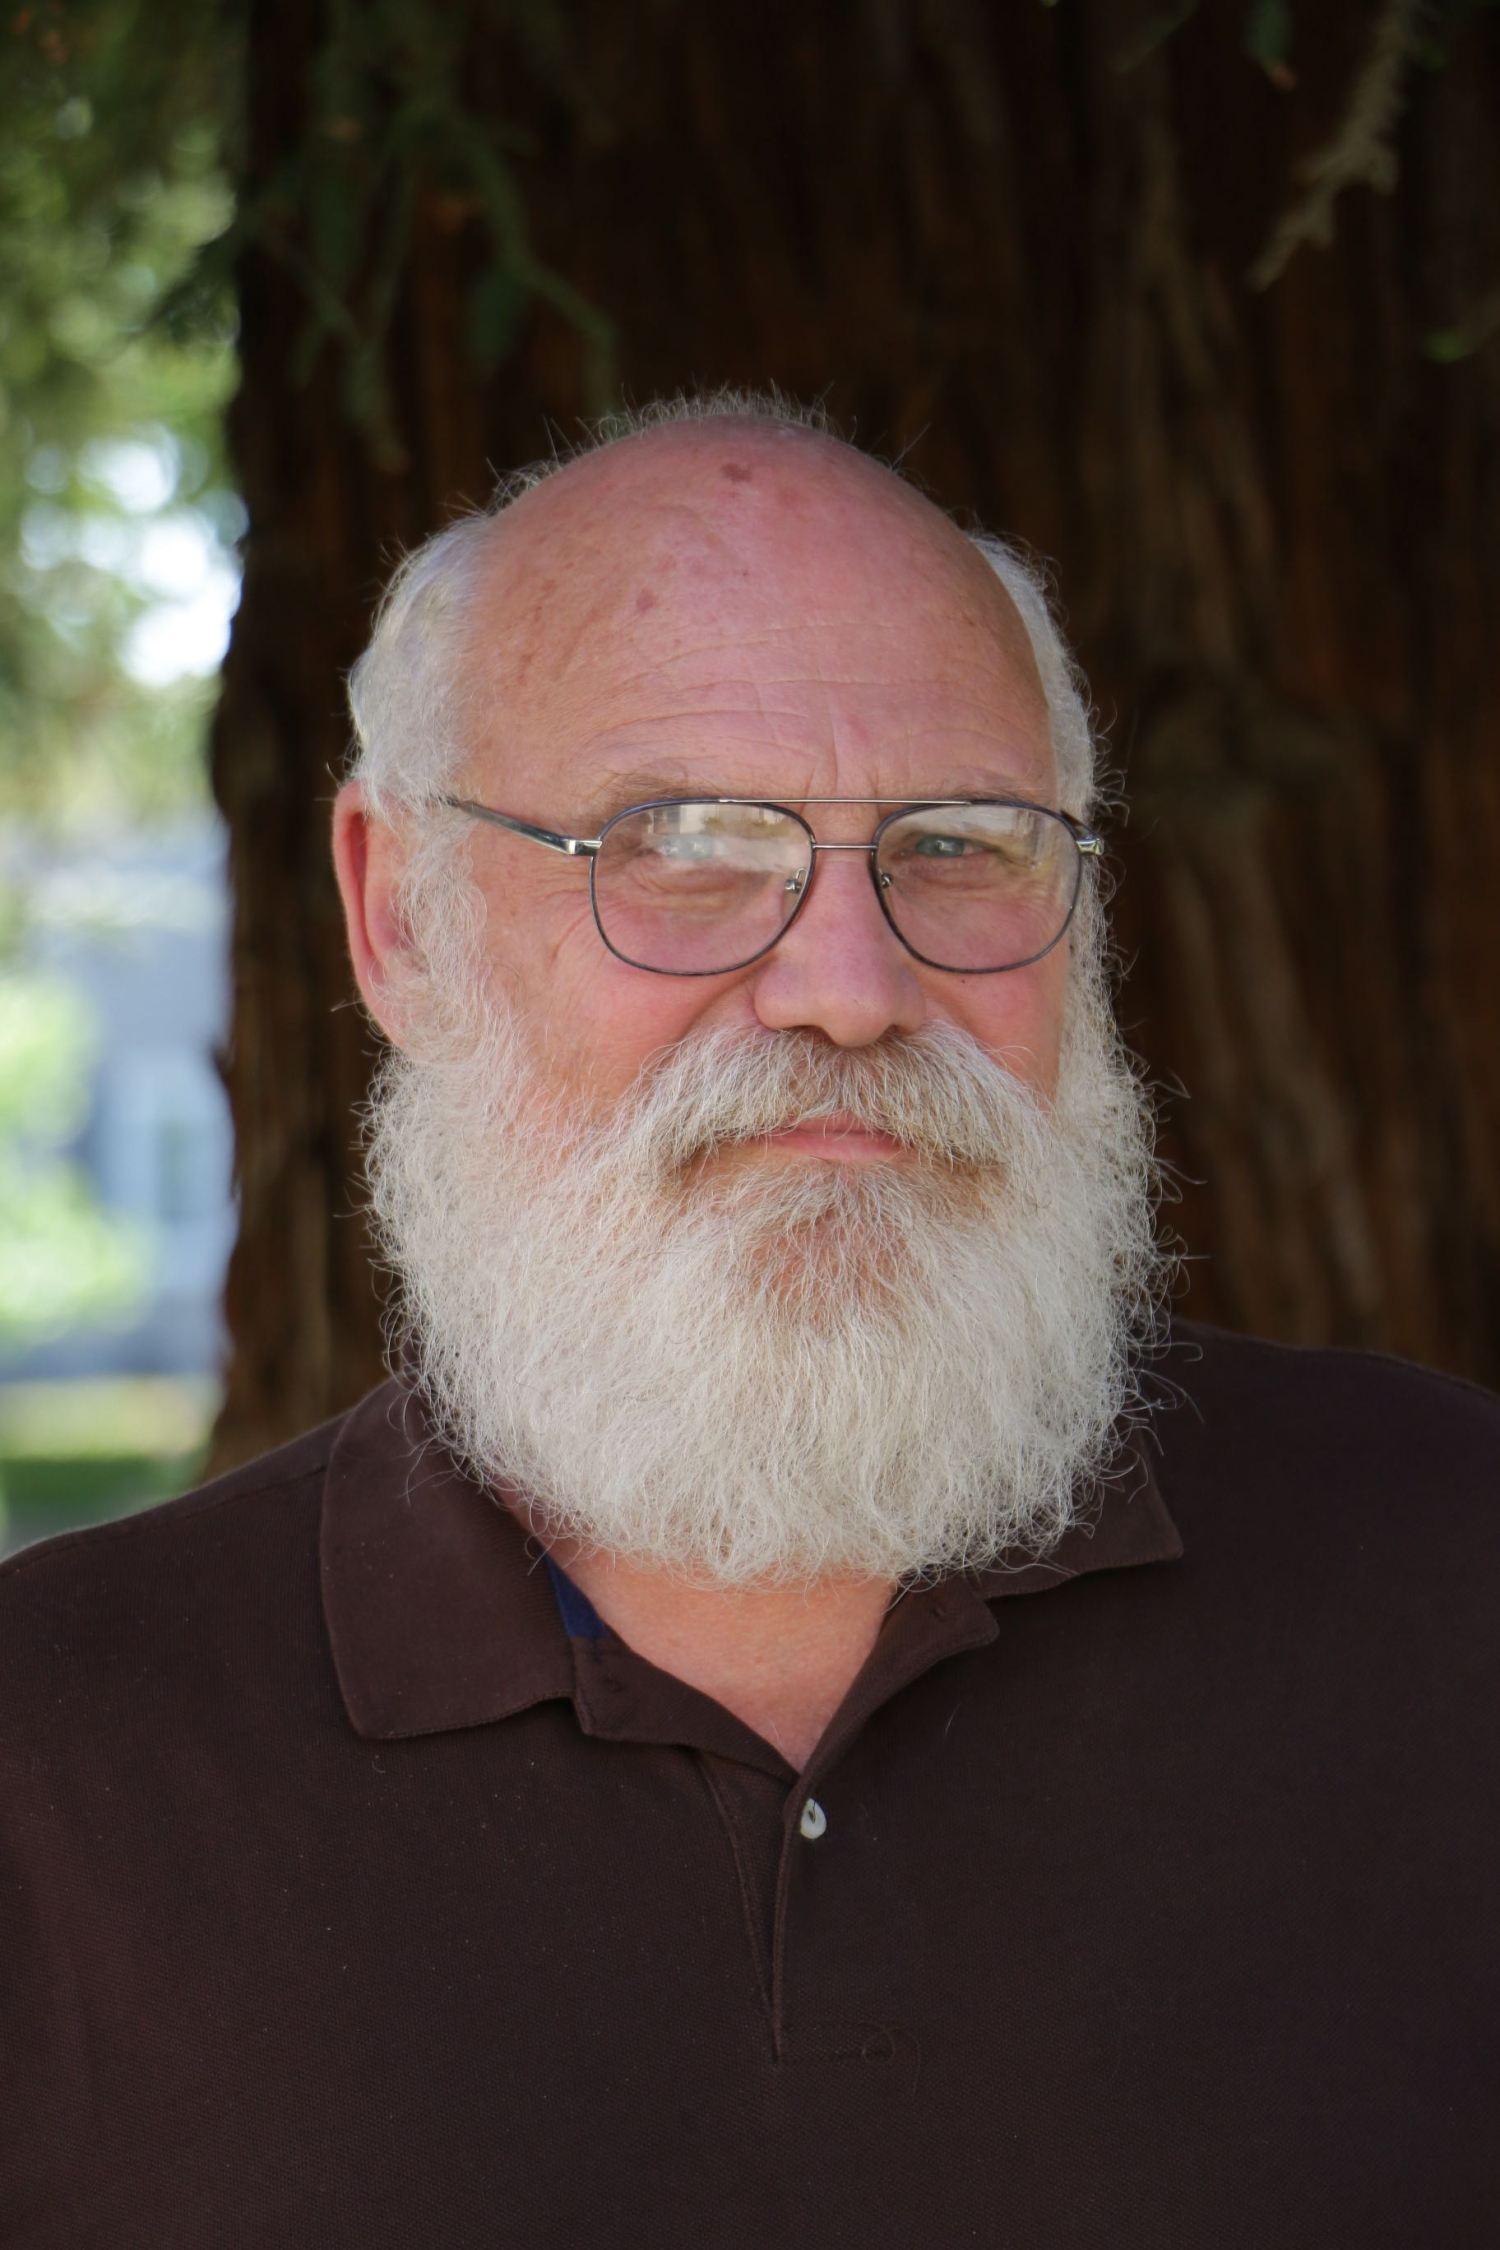 Steve Nagle